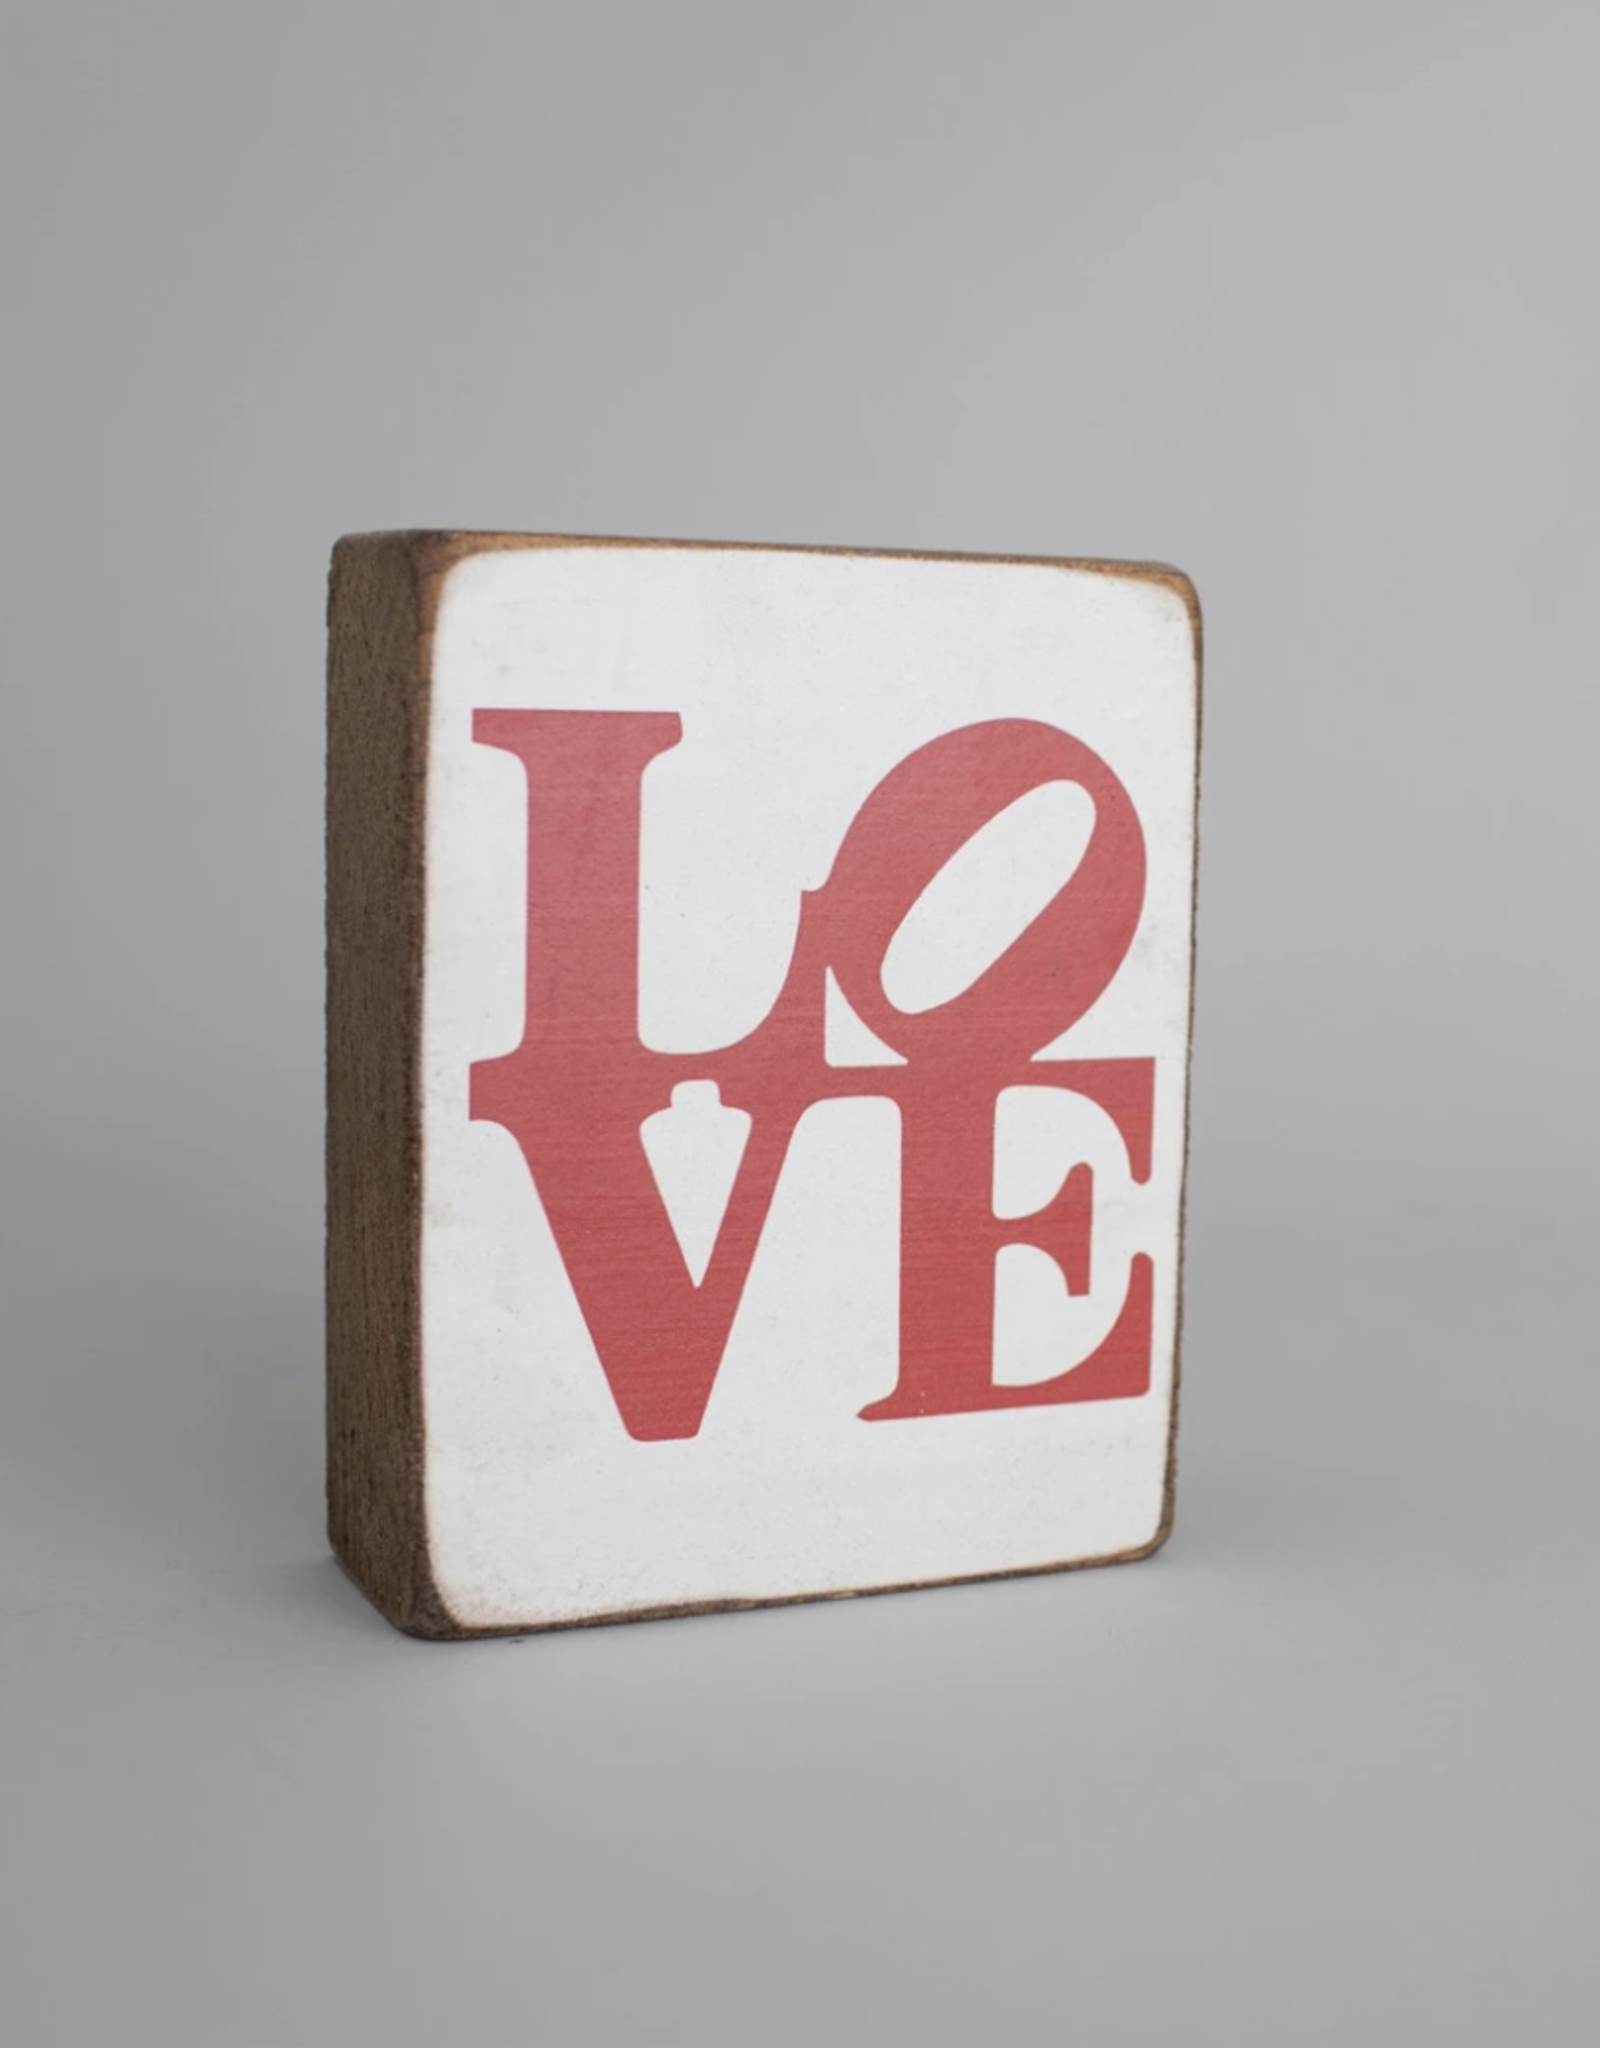 Rustic Marlin Rustic Marlin - Wood Block LOVE - Stacked Red